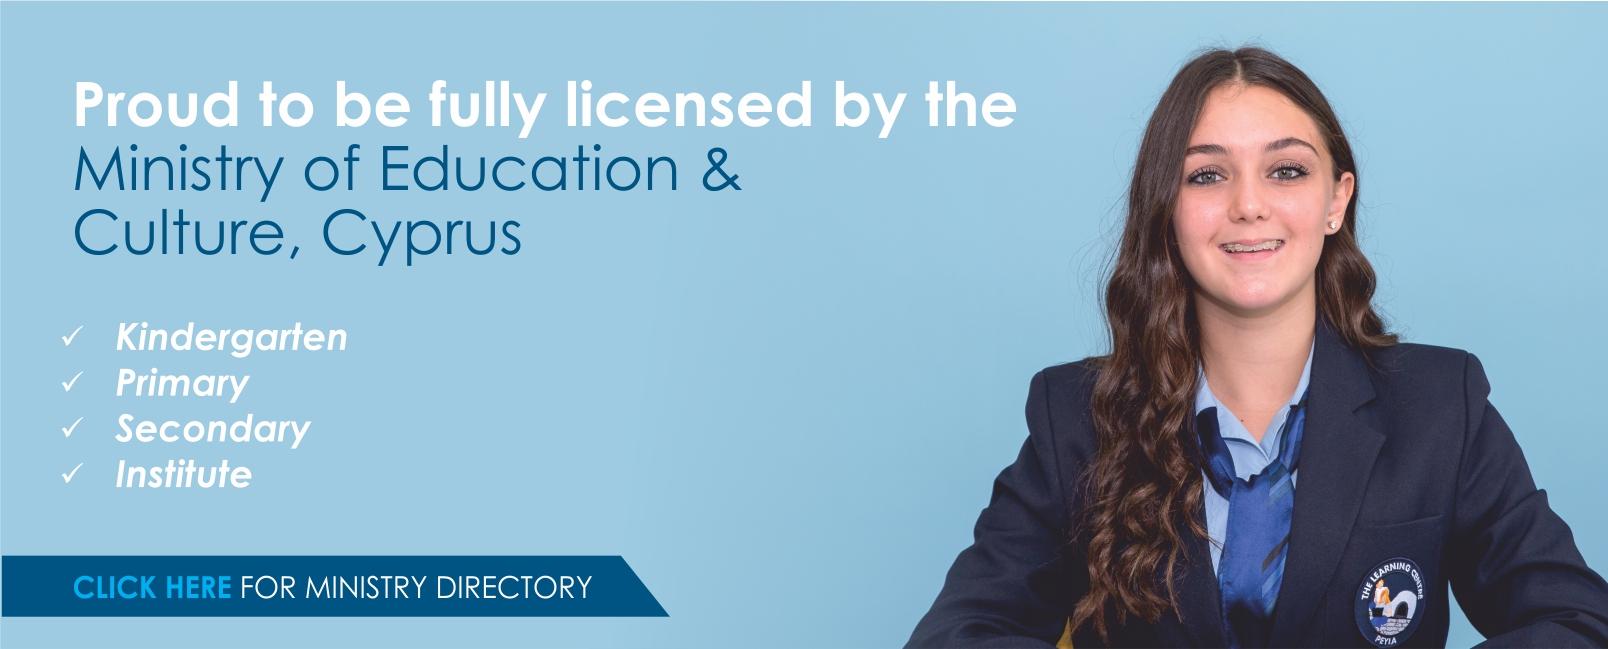 fully_licensed_click